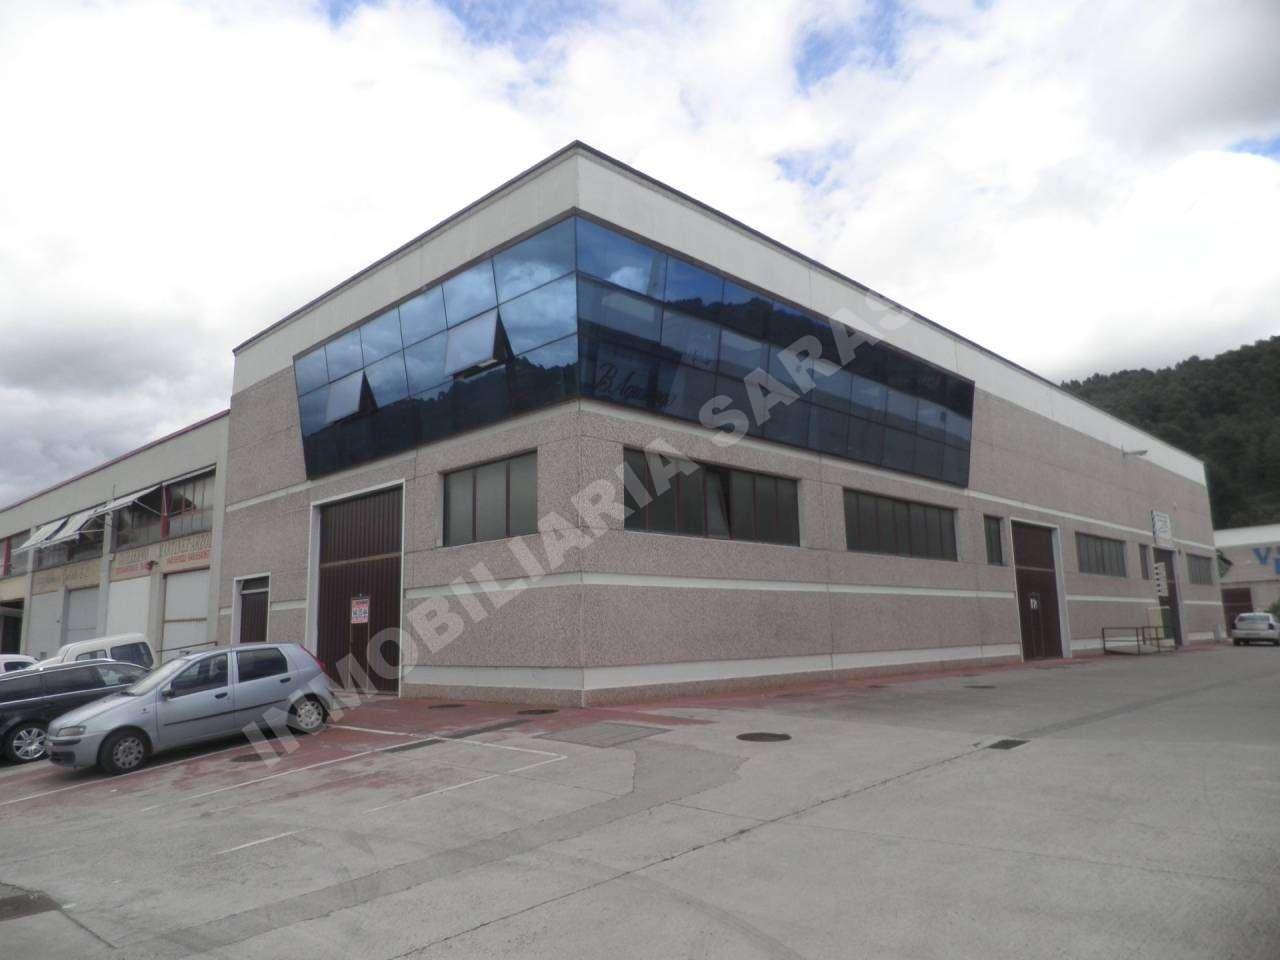 VENTA DE NAVE INDUSTRIAL EN CALLE MERCATONDOA, ESTELLA-LIZARRA | REF. (000803)